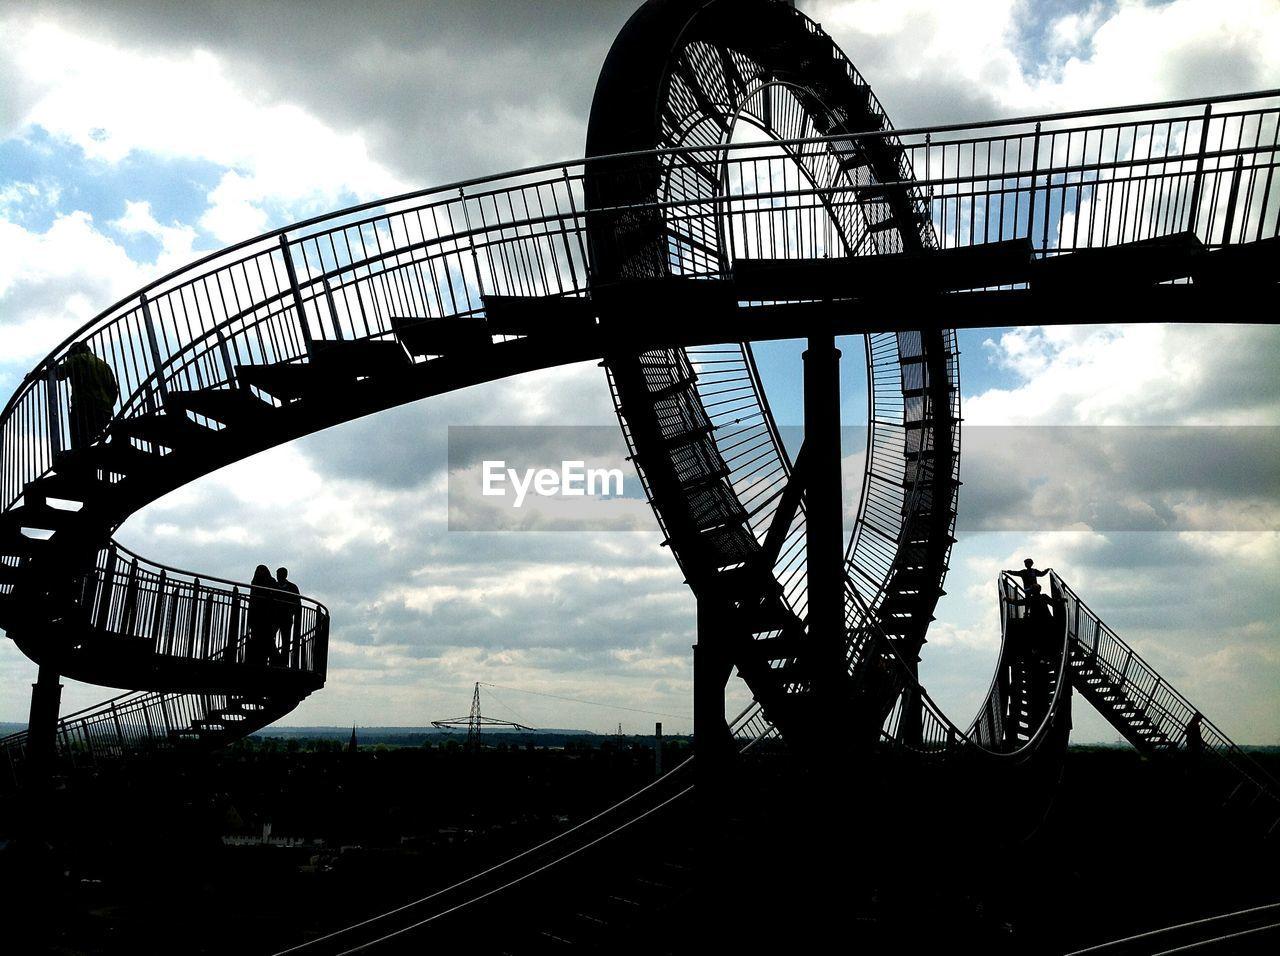 sky, cloud - sky, amusement park, arts culture and entertainment, low angle view, rollercoaster, built structure, amusement park ride, railroad track, bridge - man made structure, big wheel, ferris wheel, outdoors, day, architecture, no people